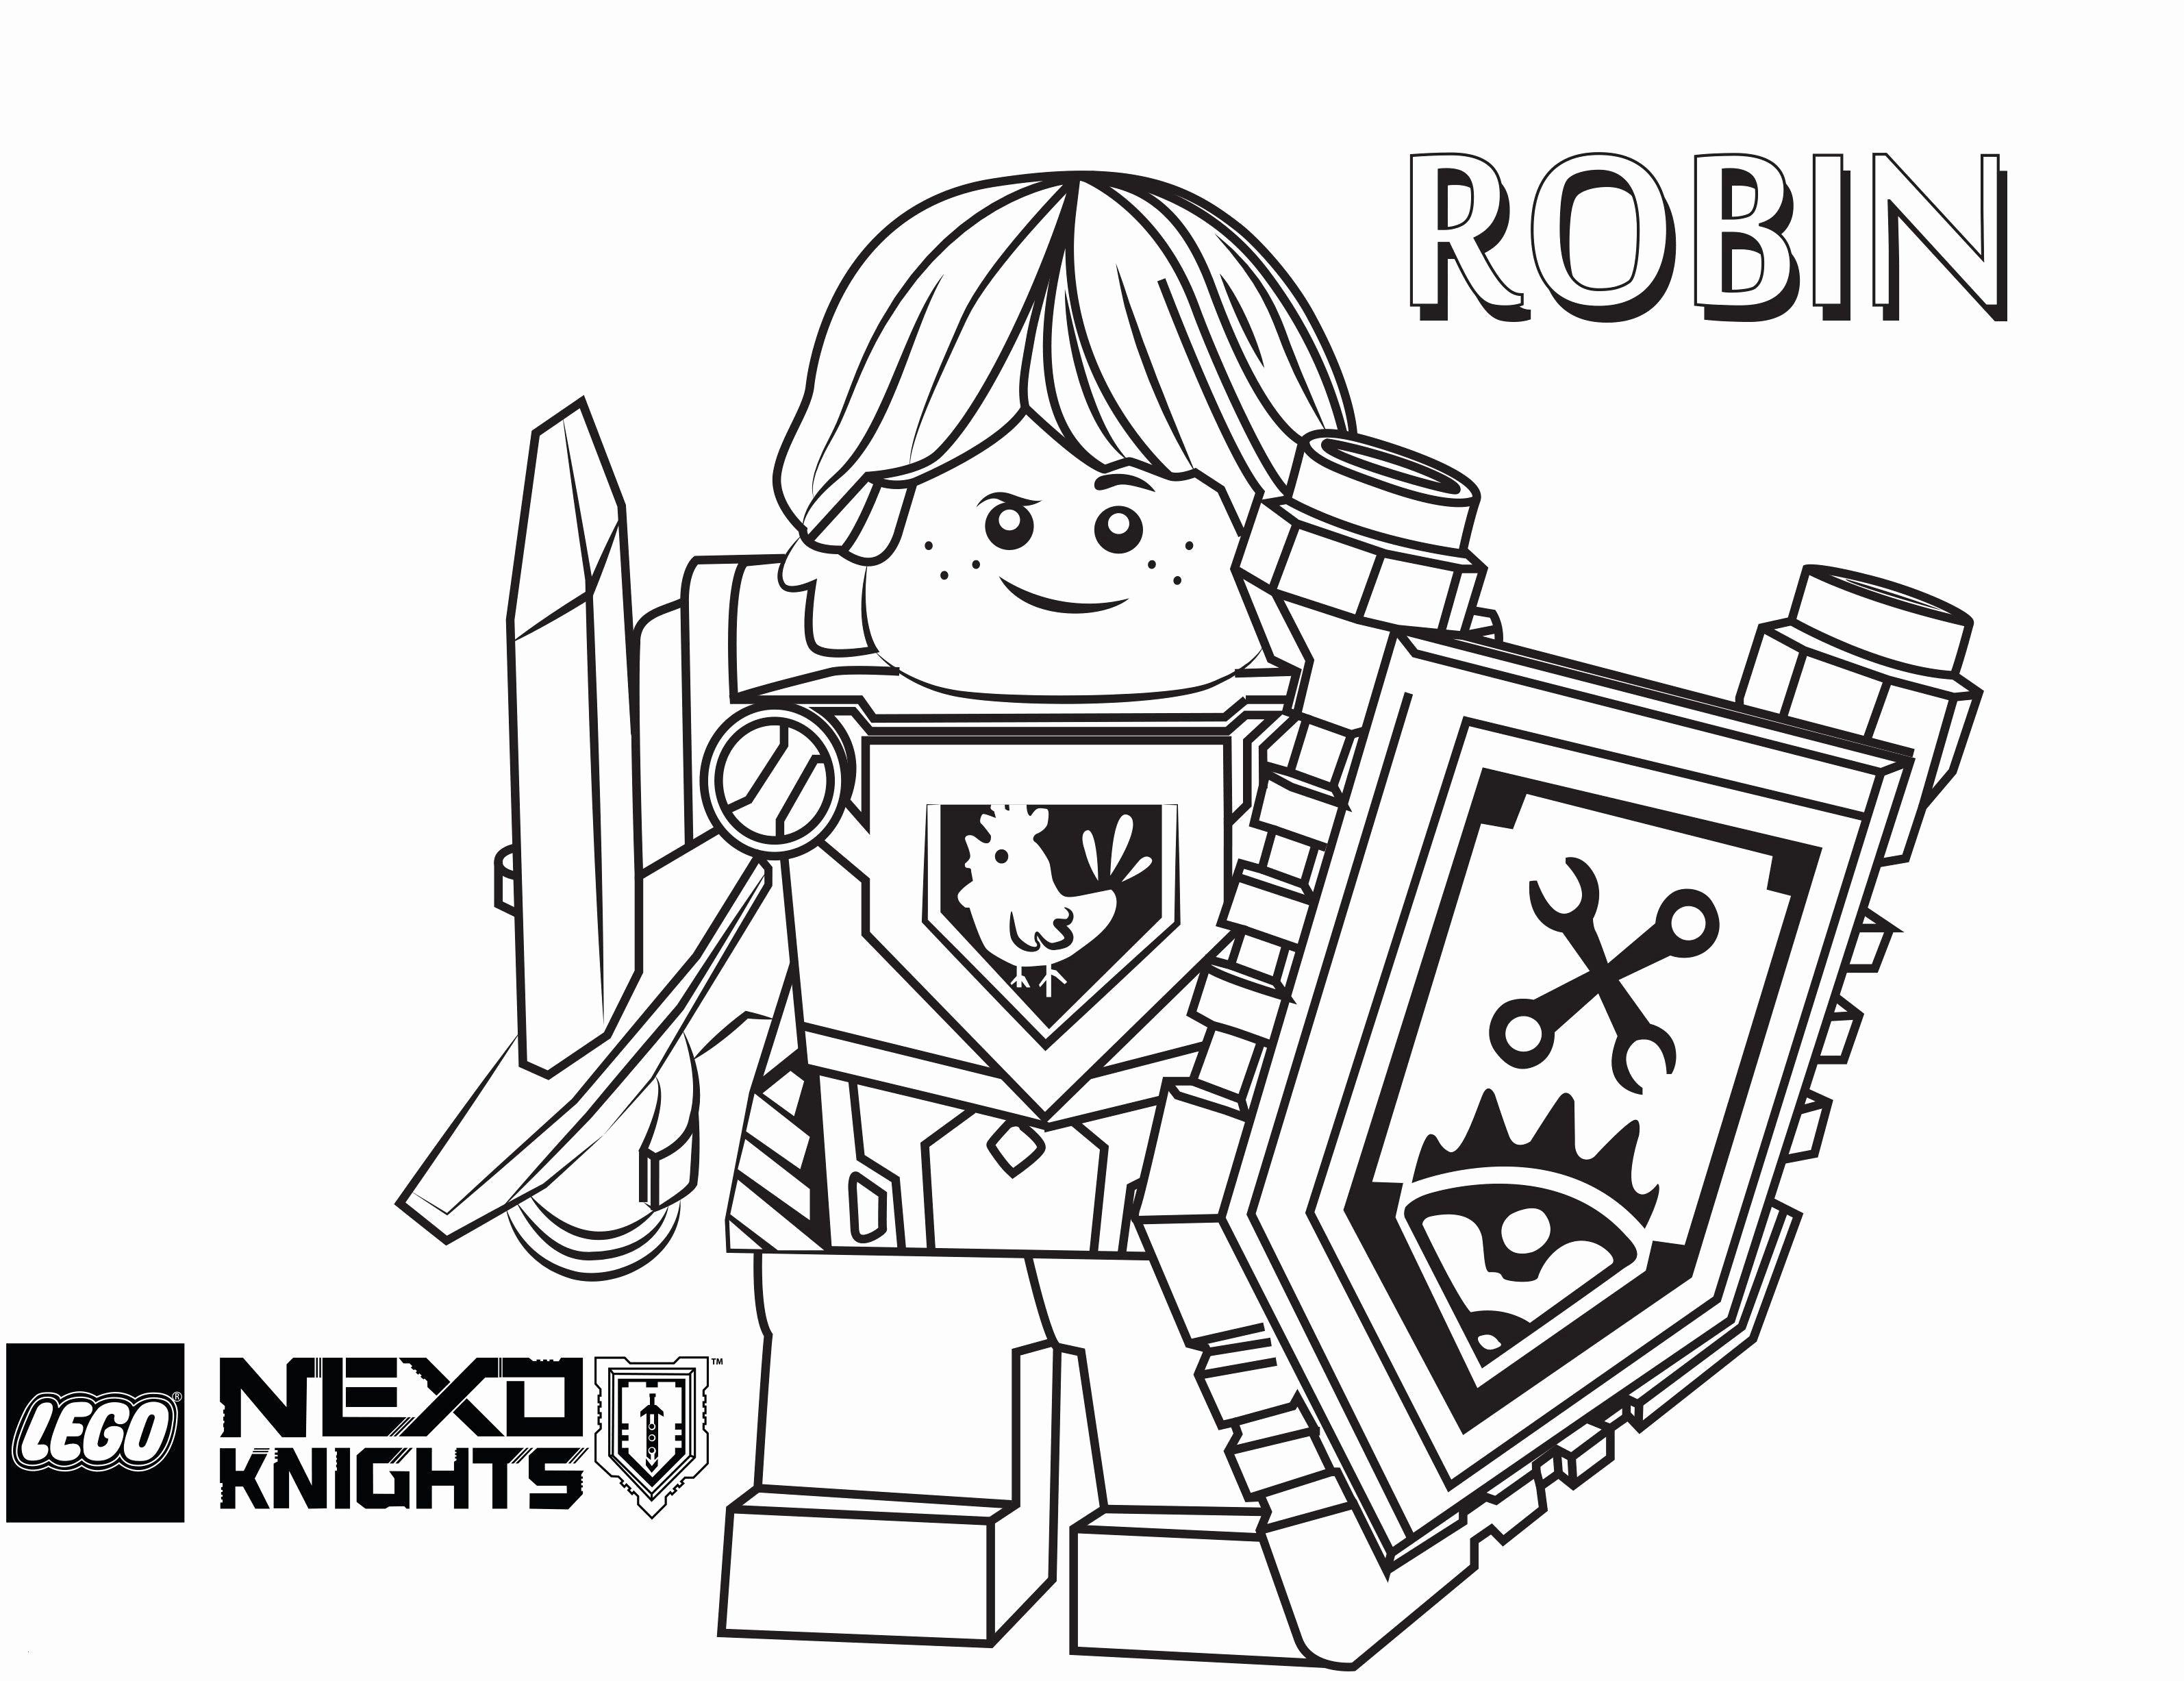 Lego Ninjago Zum Ausmalen Frisch Lego Ninjago Ausmalbilder Bilder 37 Lego Ninjago Lloyd Ausmalbilder Galerie